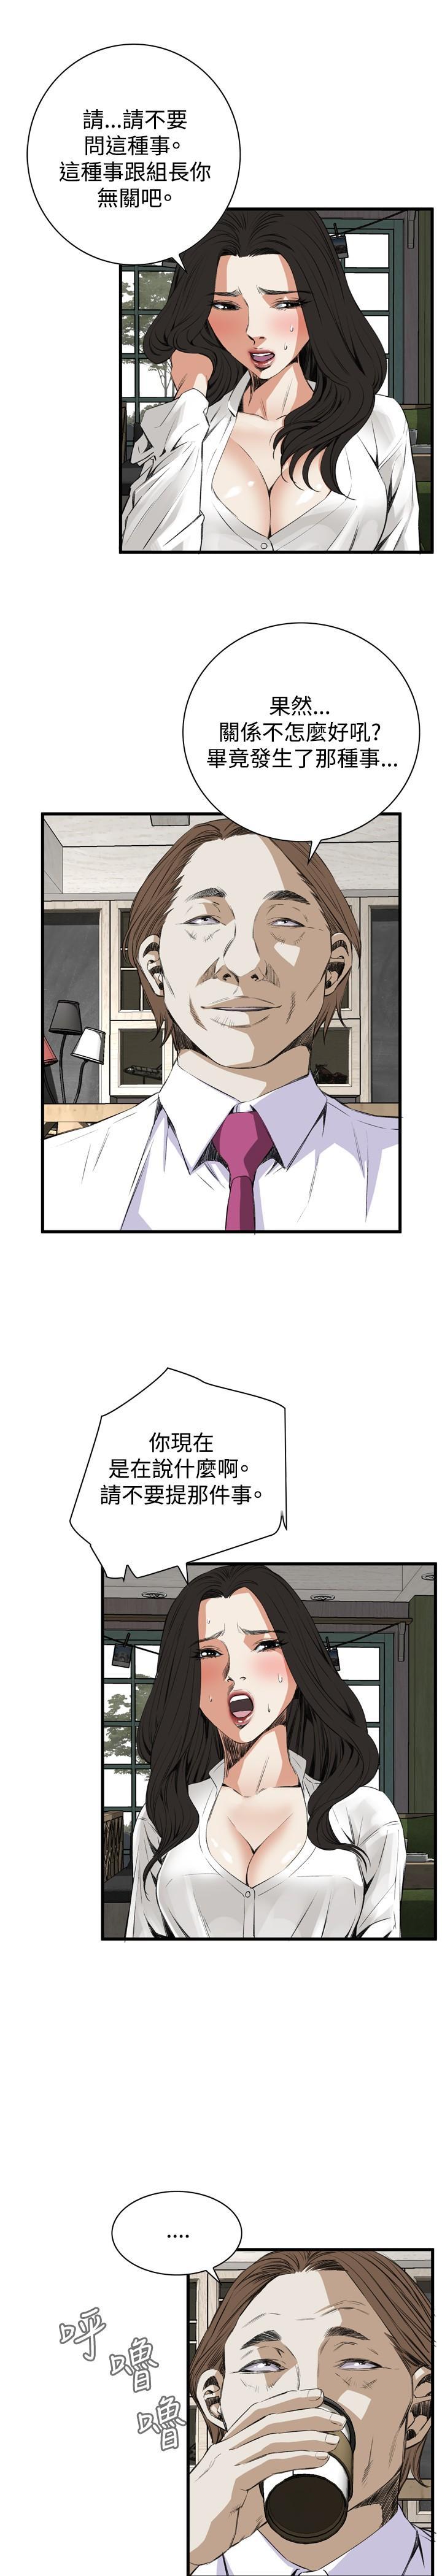 Take a Peek 偷窥 Ch.39~51 [Chinese]中文 264